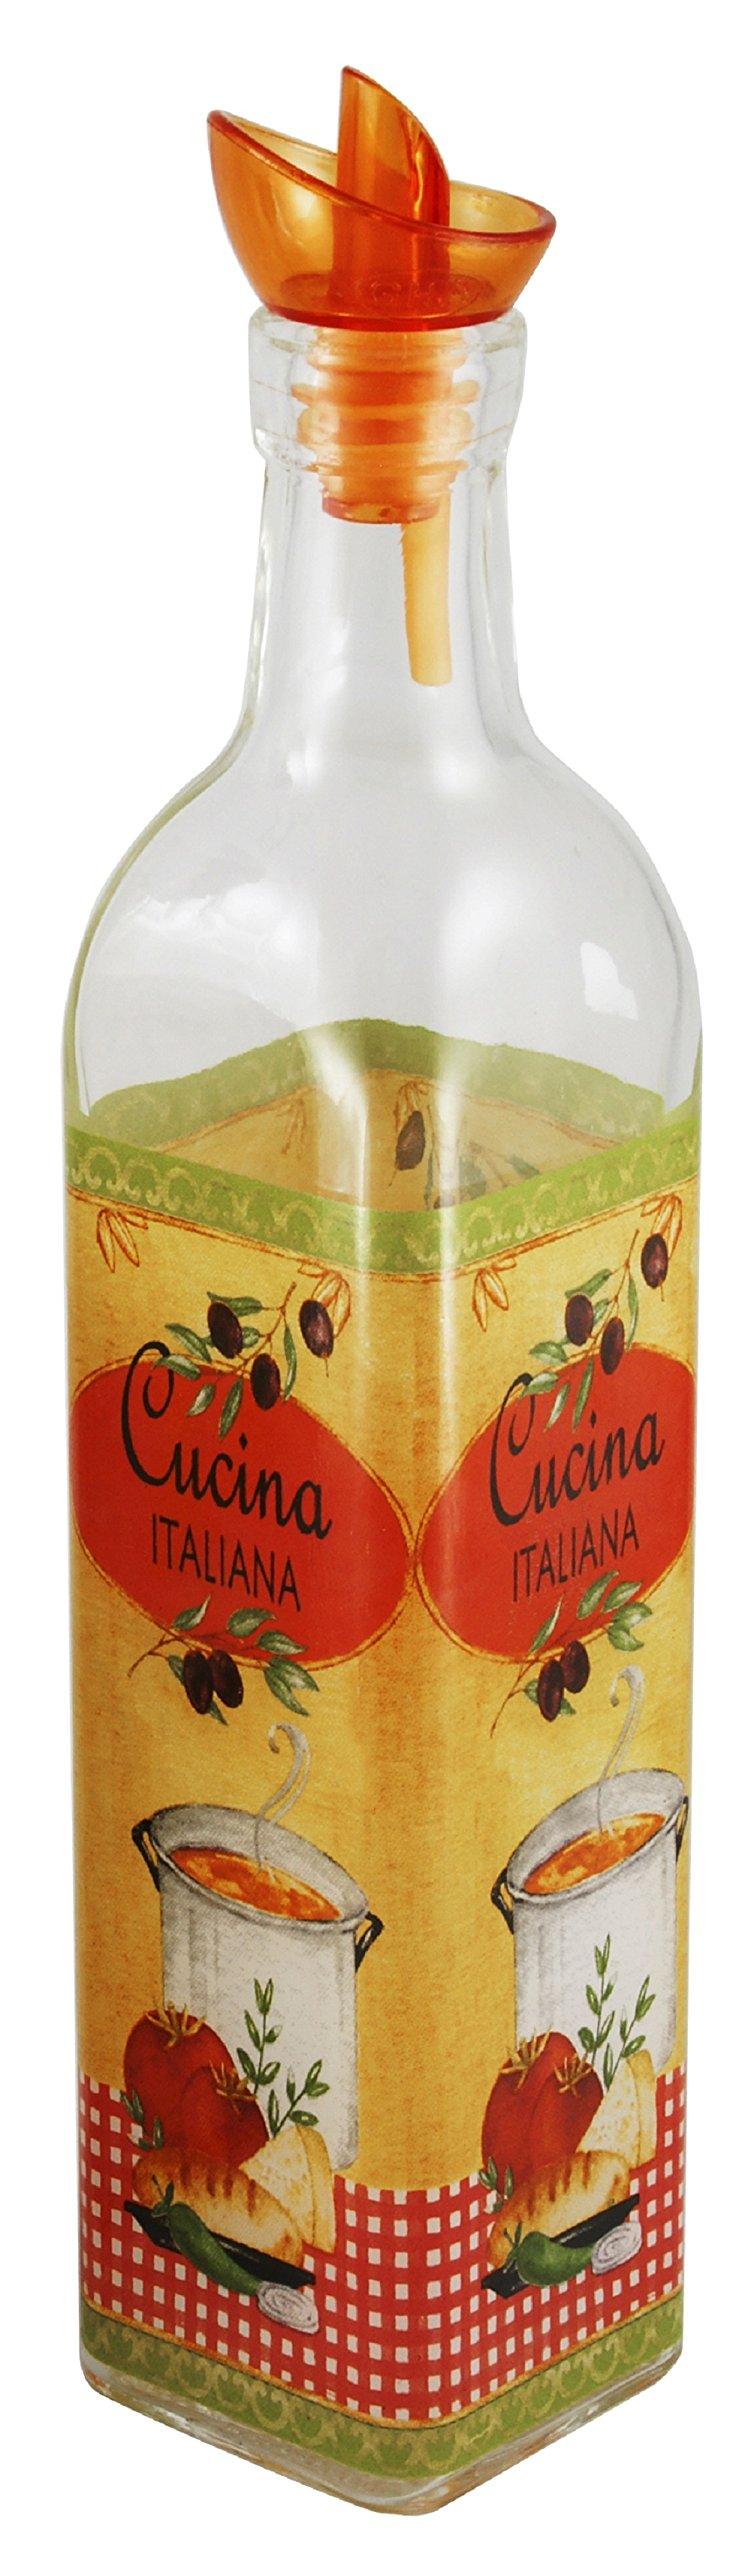 Grant Howard Cucina Italiano Oil and Vinegar Cruet, 16 oz.